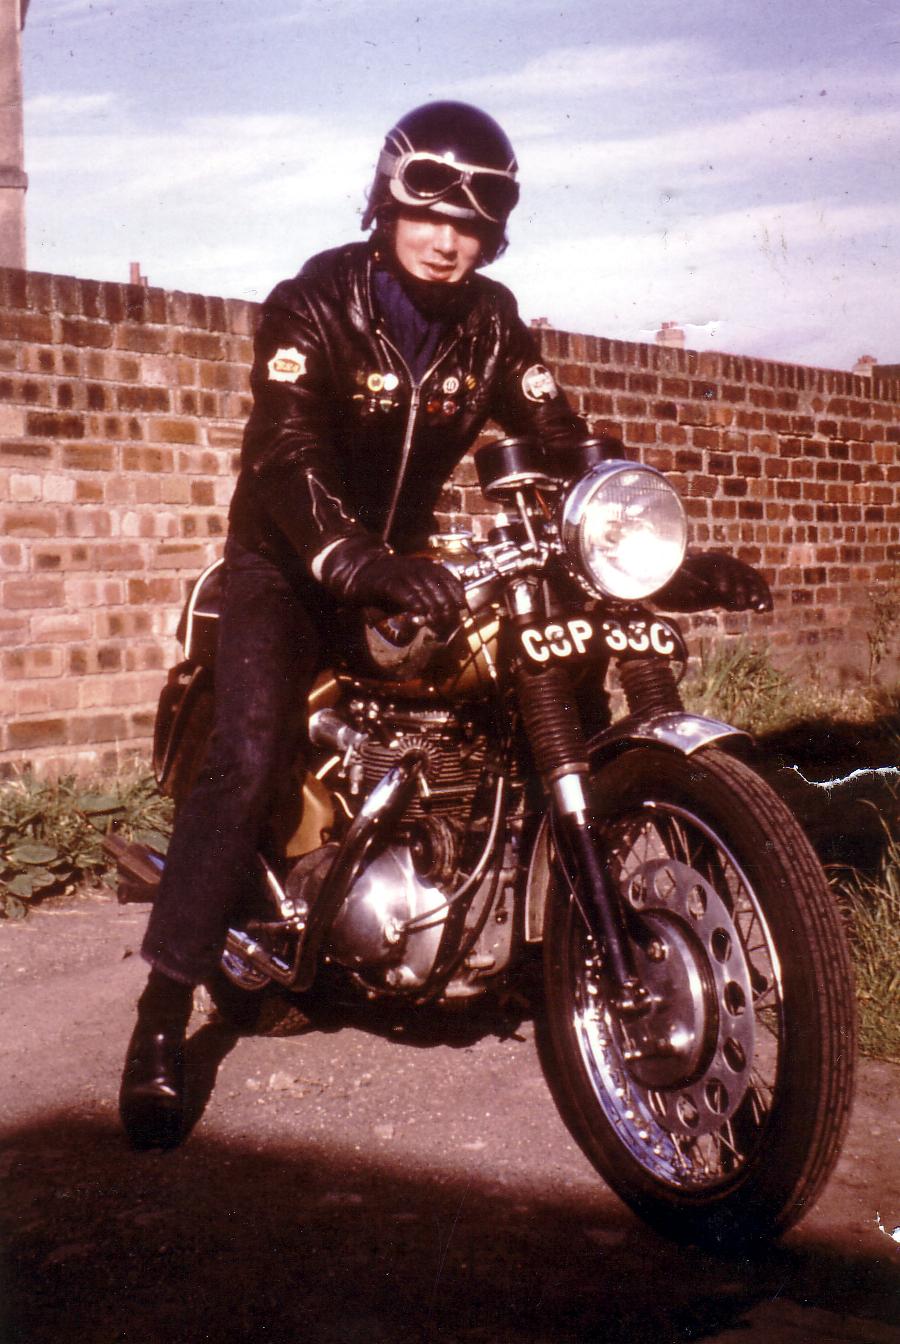 Motorcyclist On His Bike 1969